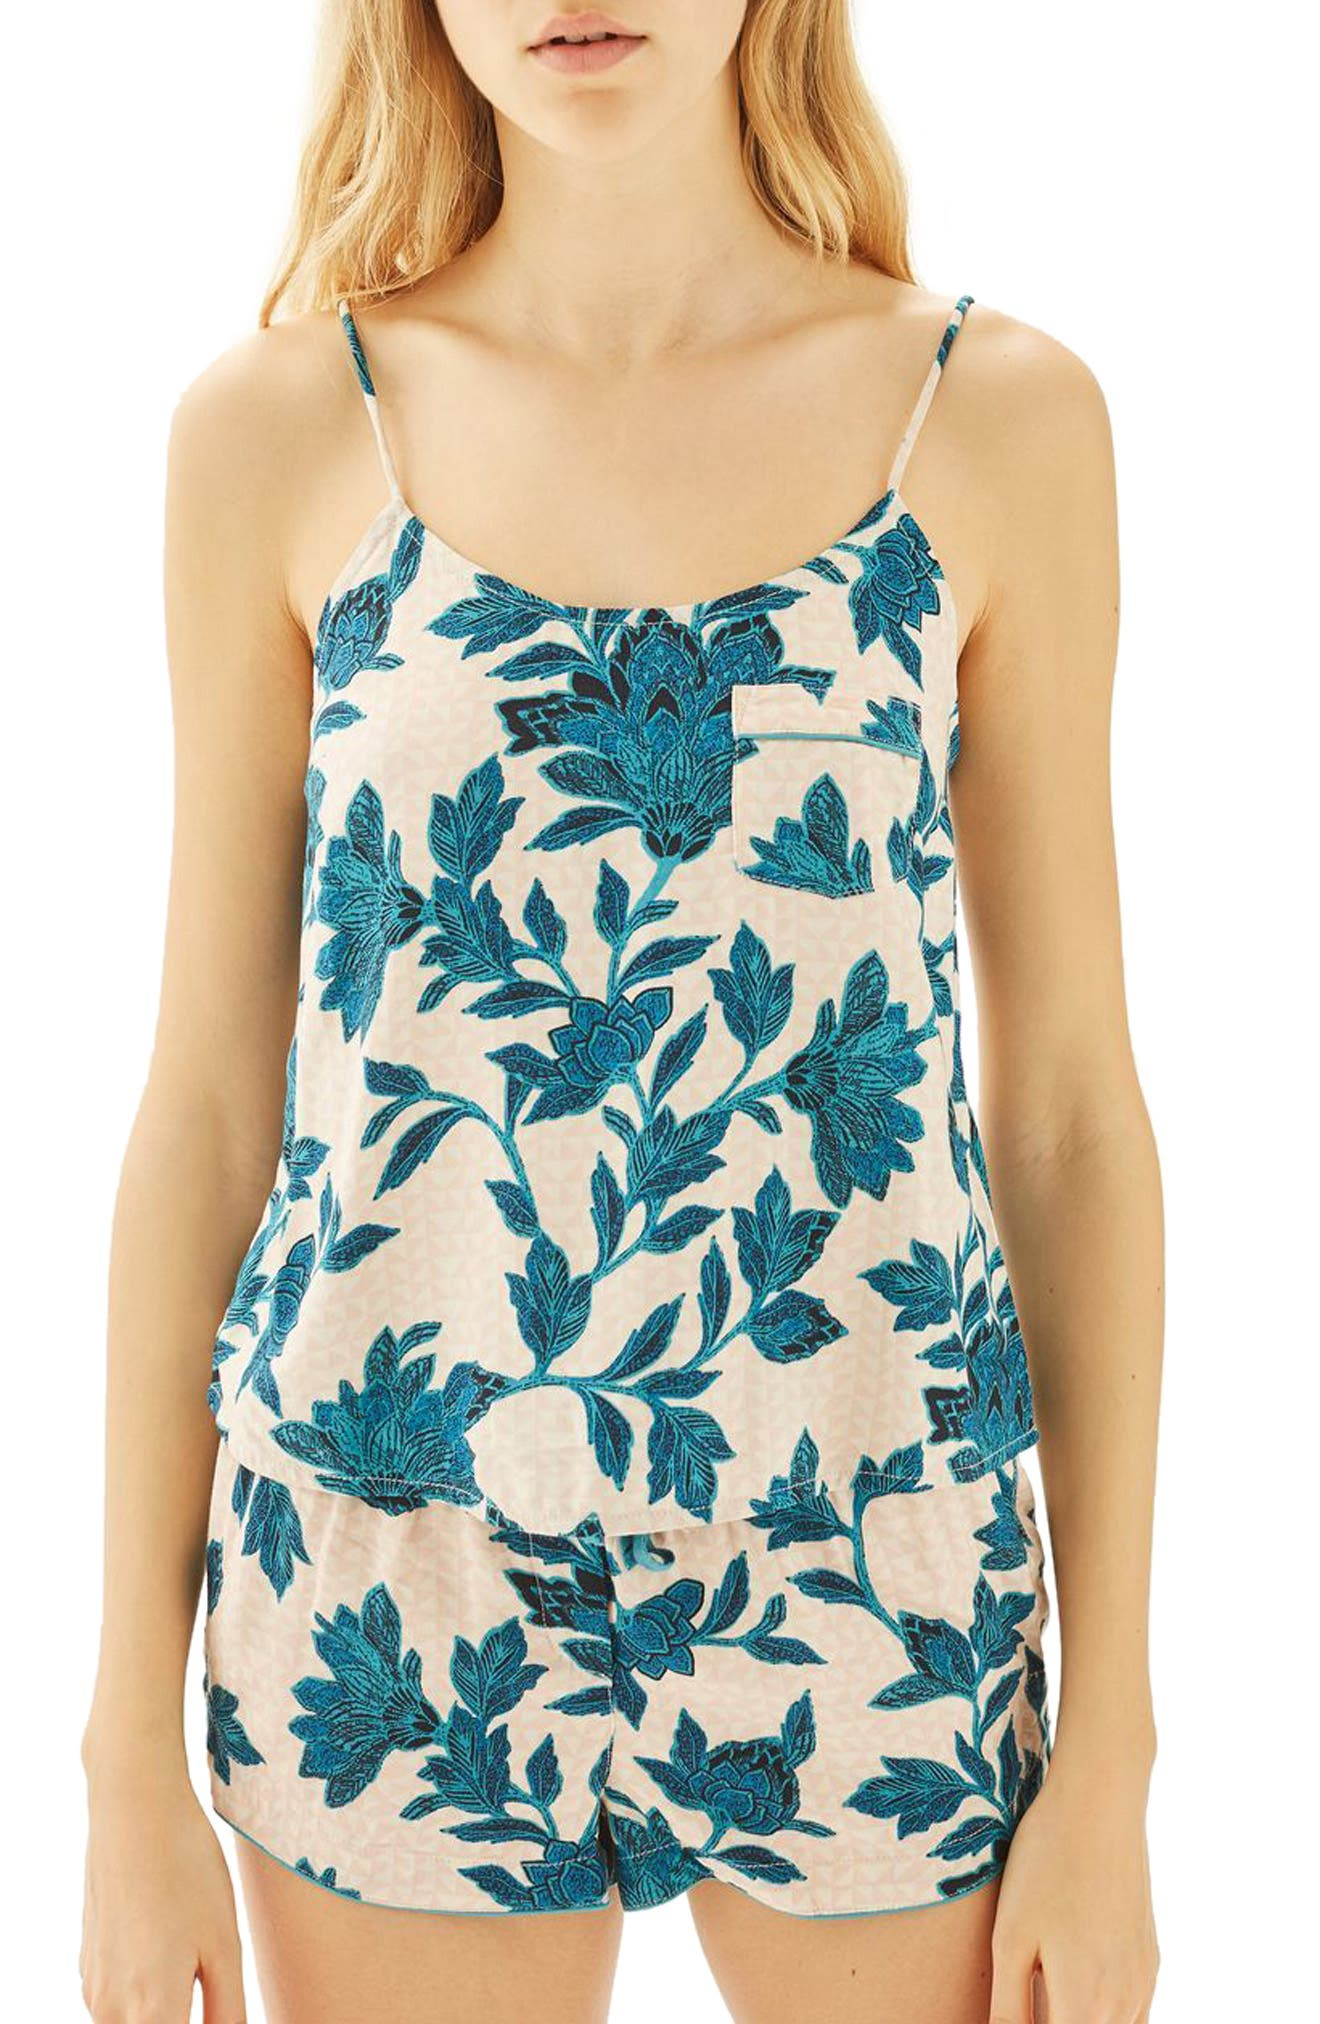 Topshop Geometric Floral Short Pajamas